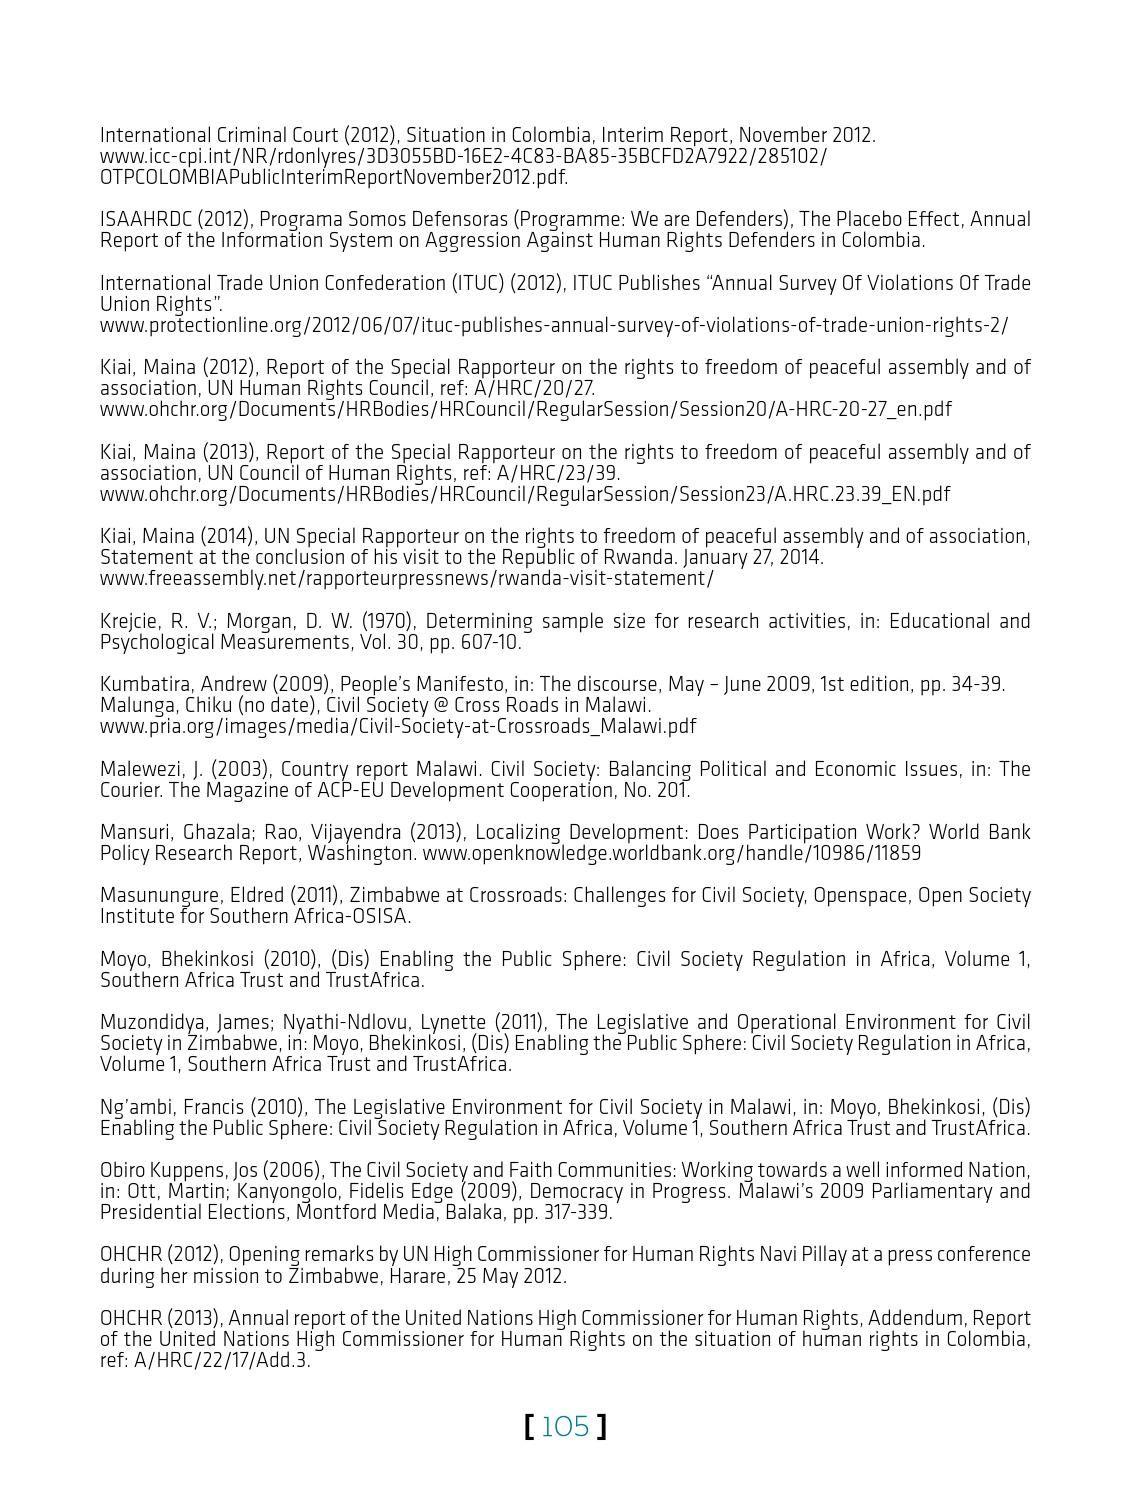 Top Five Rapporteur Report Sample Regarding Rapporteur Report Template Great Cretive Templates Report Template Support Pictures Human Rights Defenders